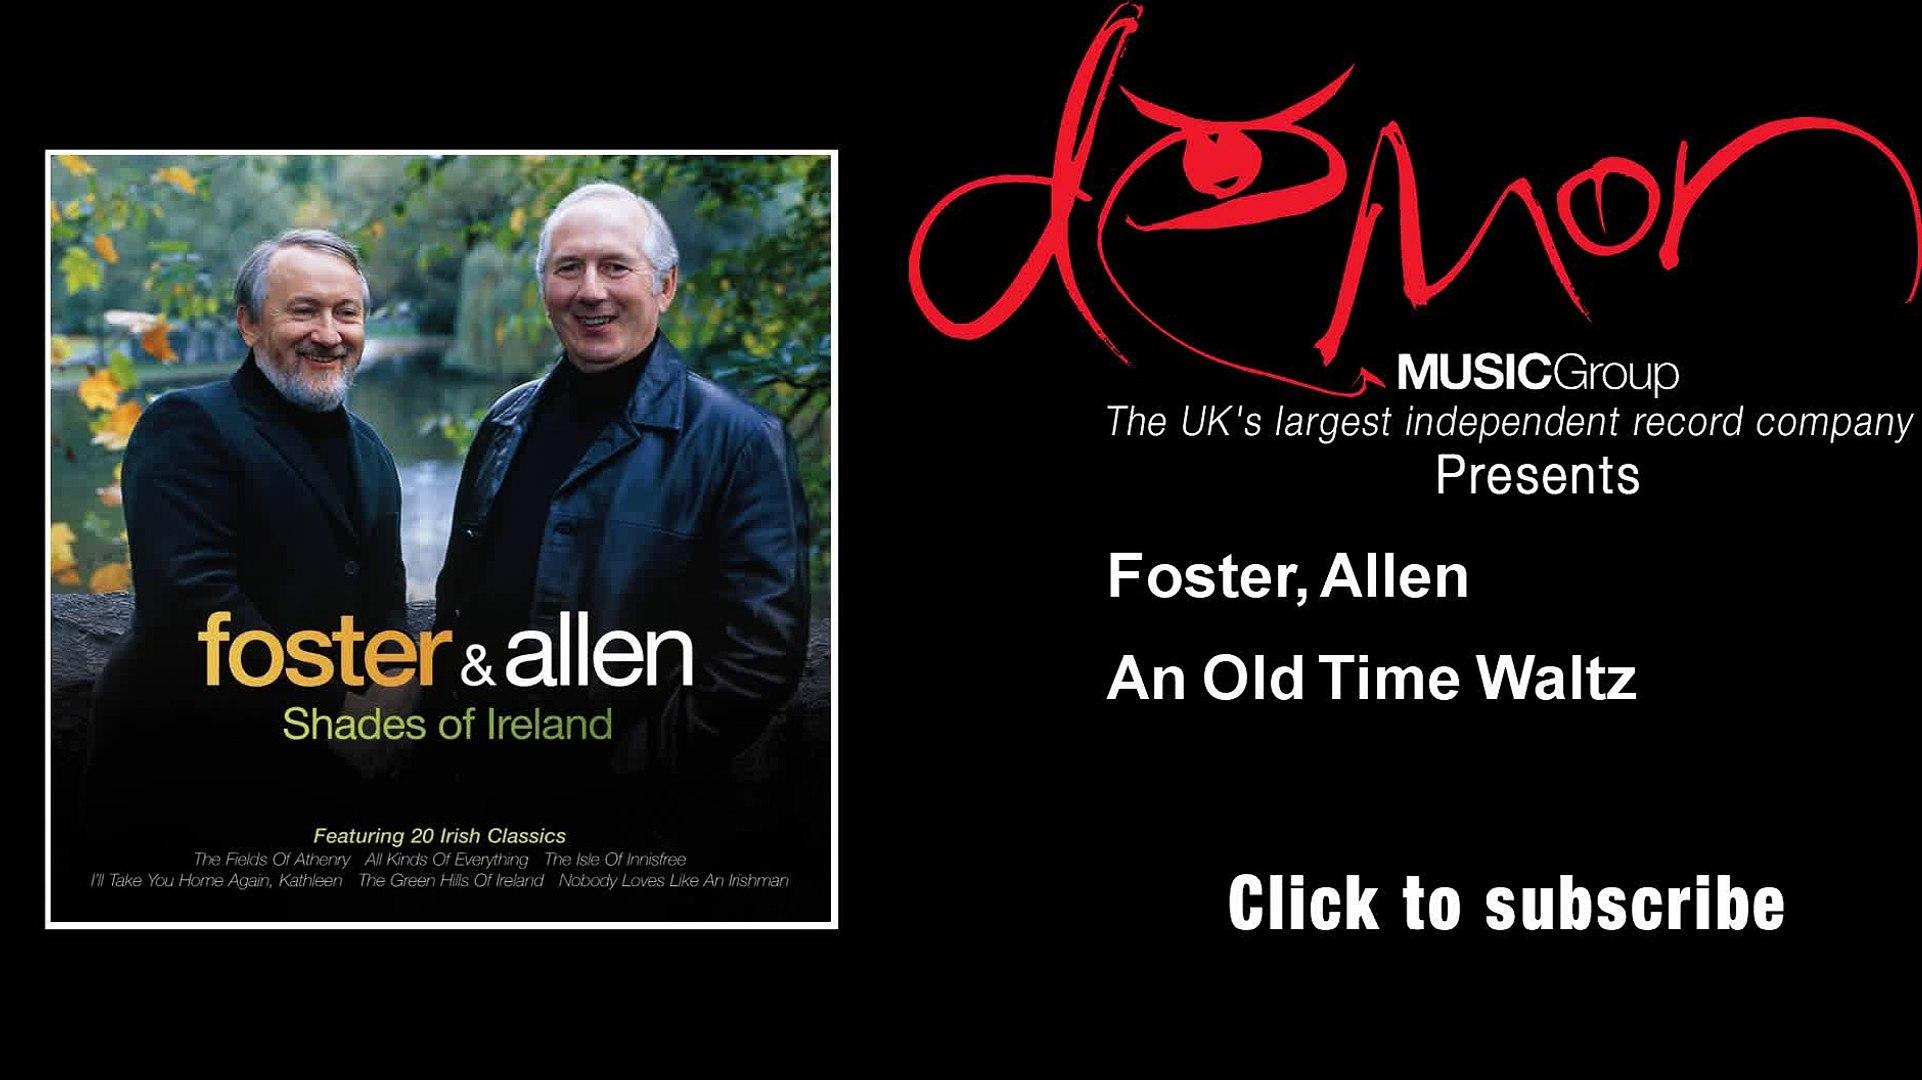 Foster, Allen - An Old Time Waltz